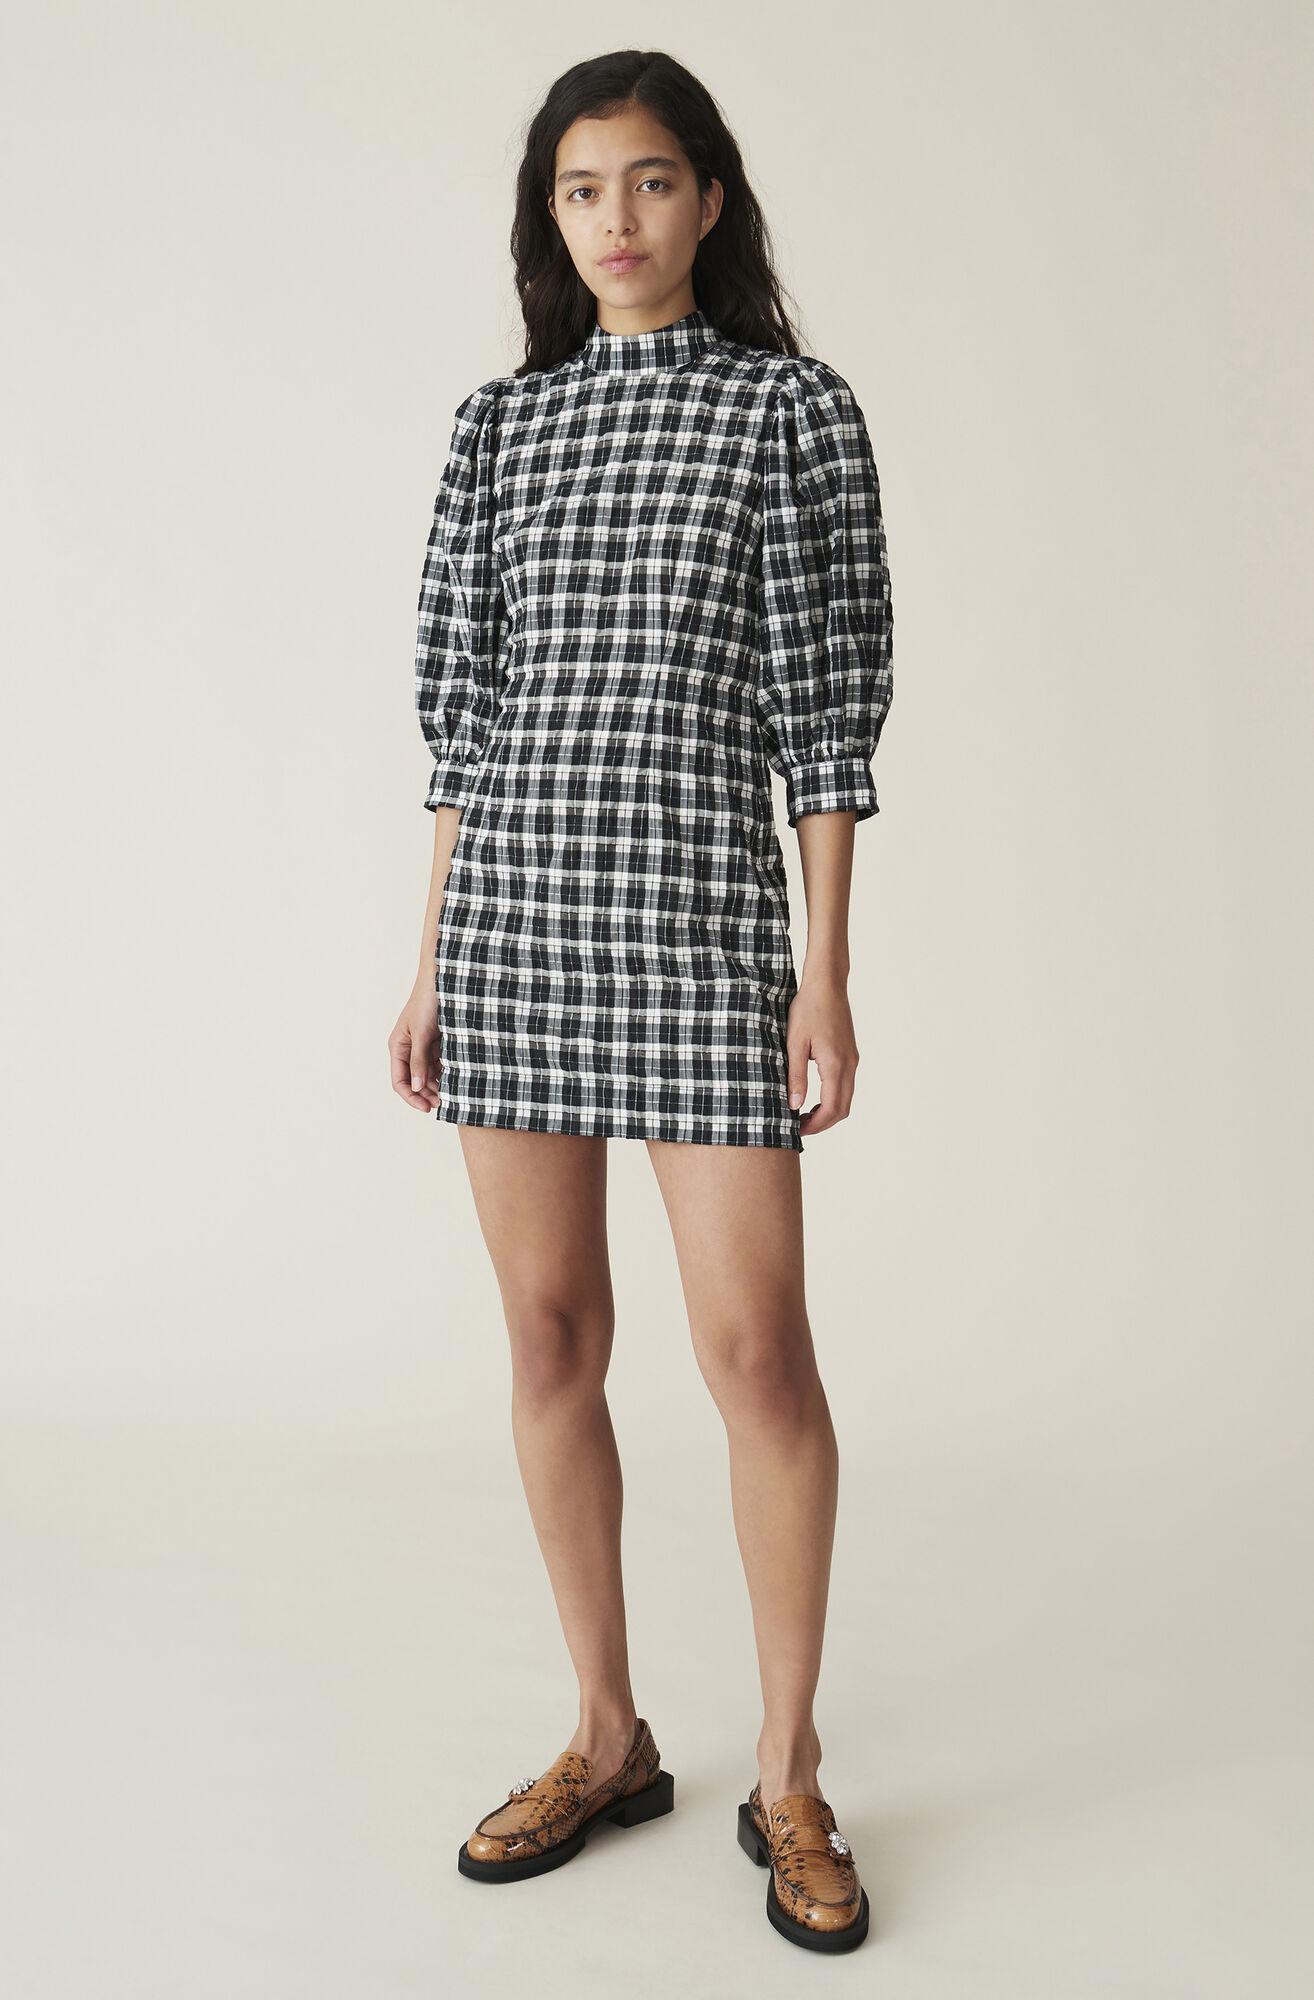 Ganni Seersucker Check Mini Dress 82 00 Eur Shop Your New